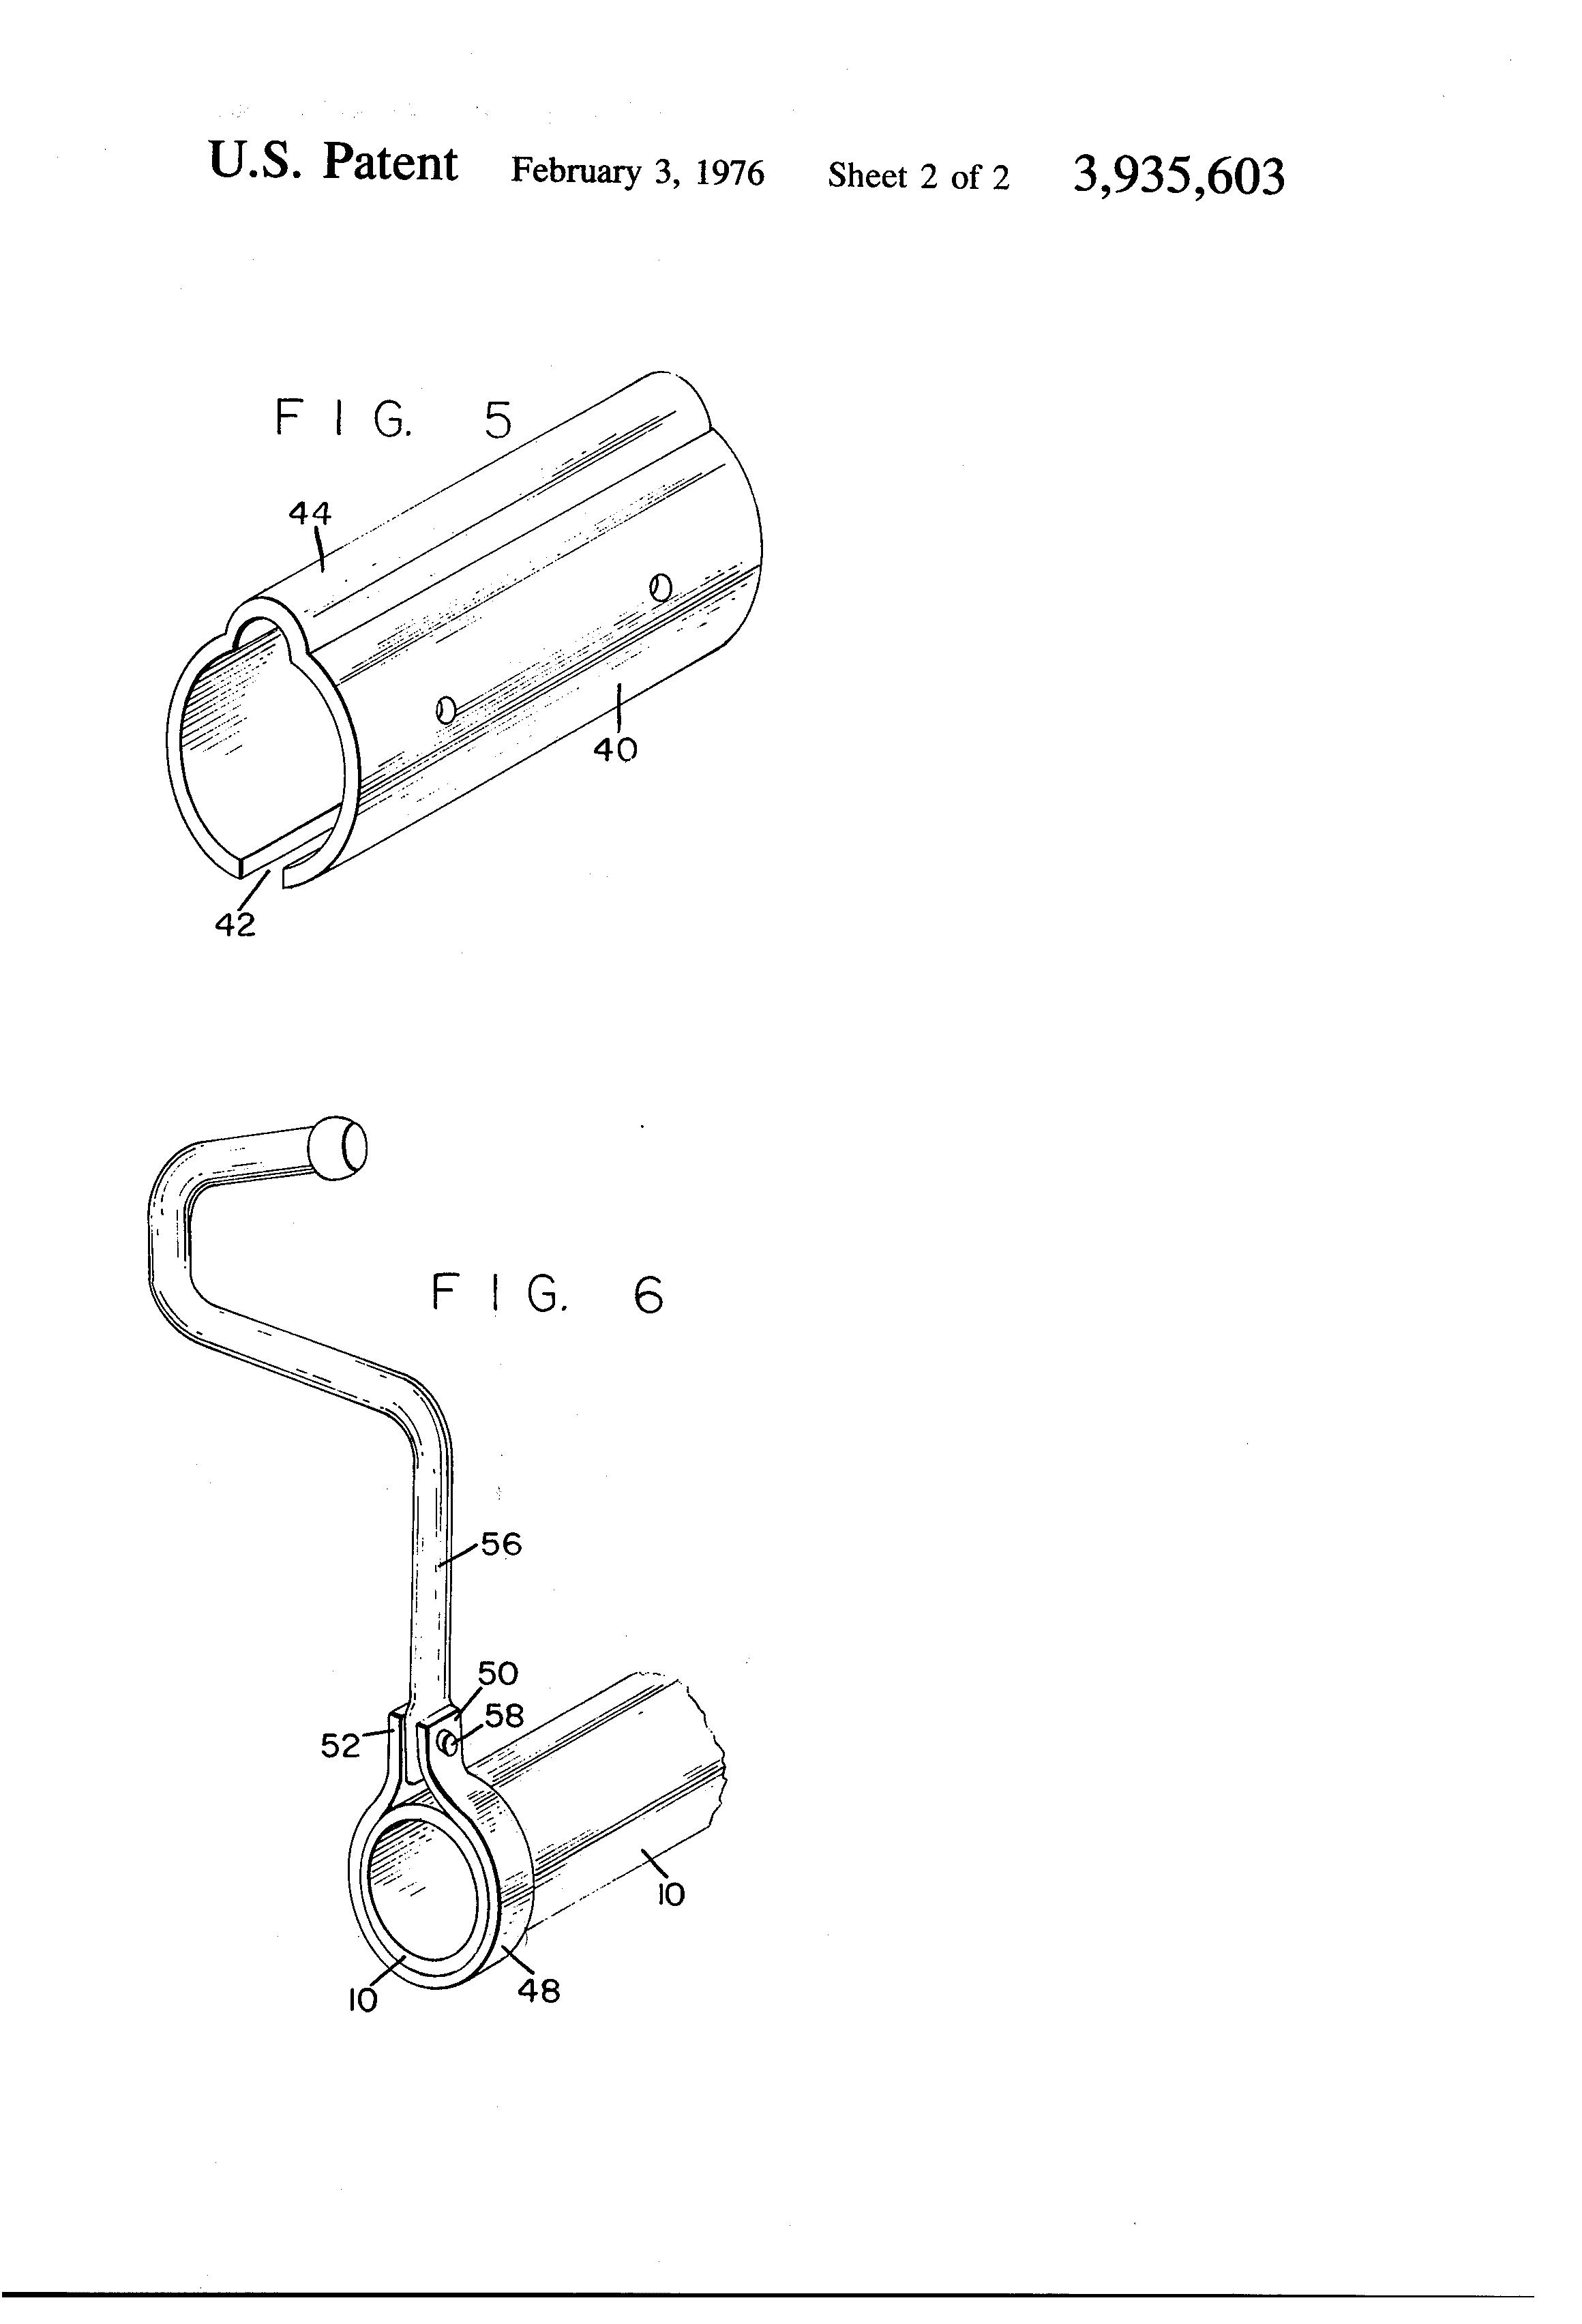 Baby crib mattress frame - Patent Drawing